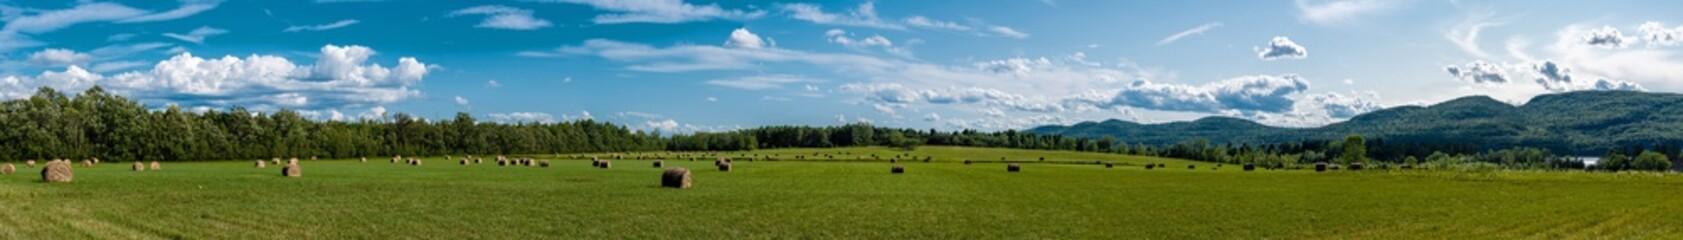 Panoramic view of a land in Adirondacks with haystacks Wall mural